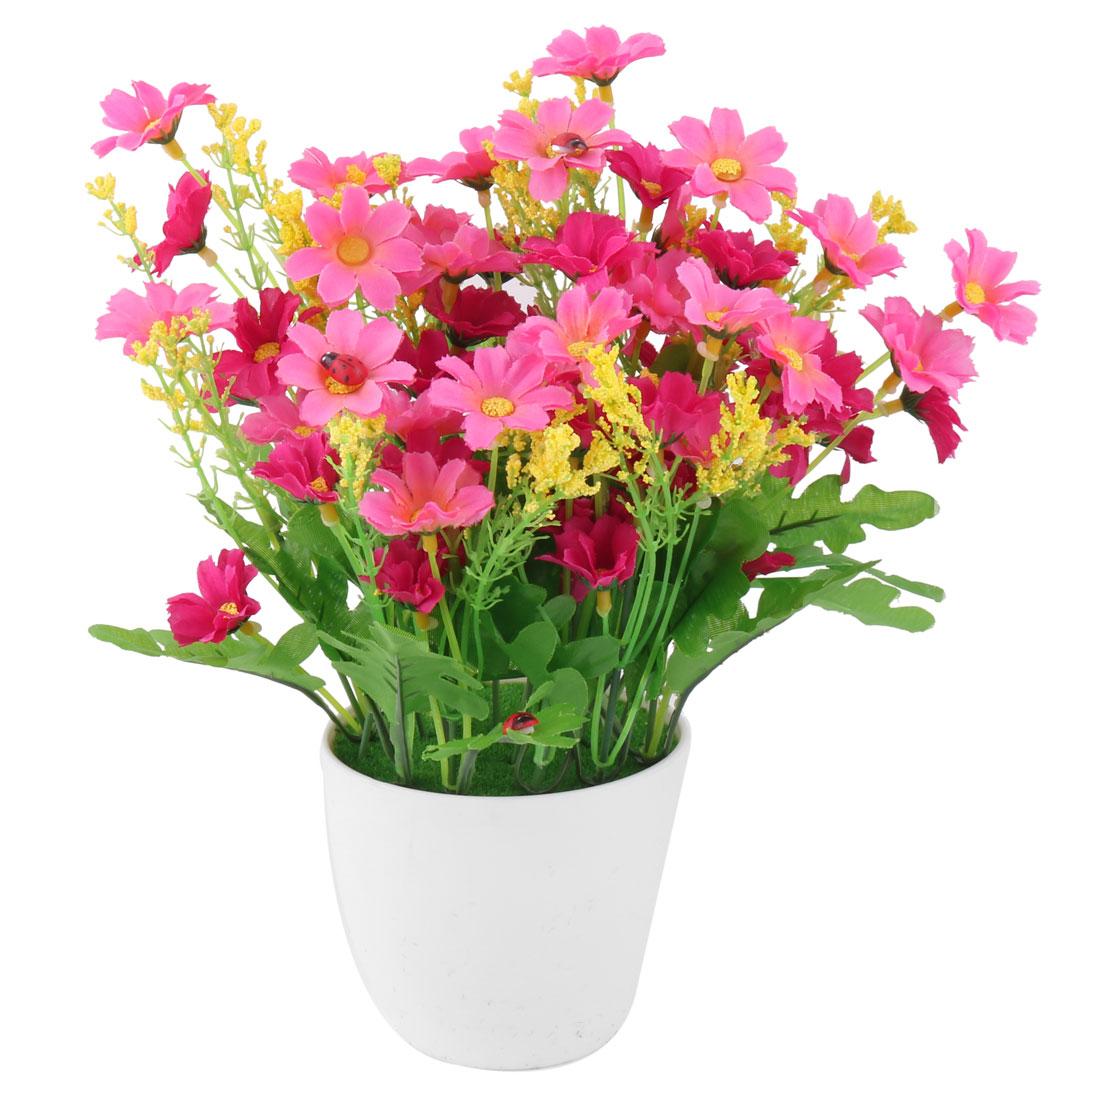 Home Plastic Artificial Dasiy Flowerpot Craft Desktop Table Decor Flower Fuchsia